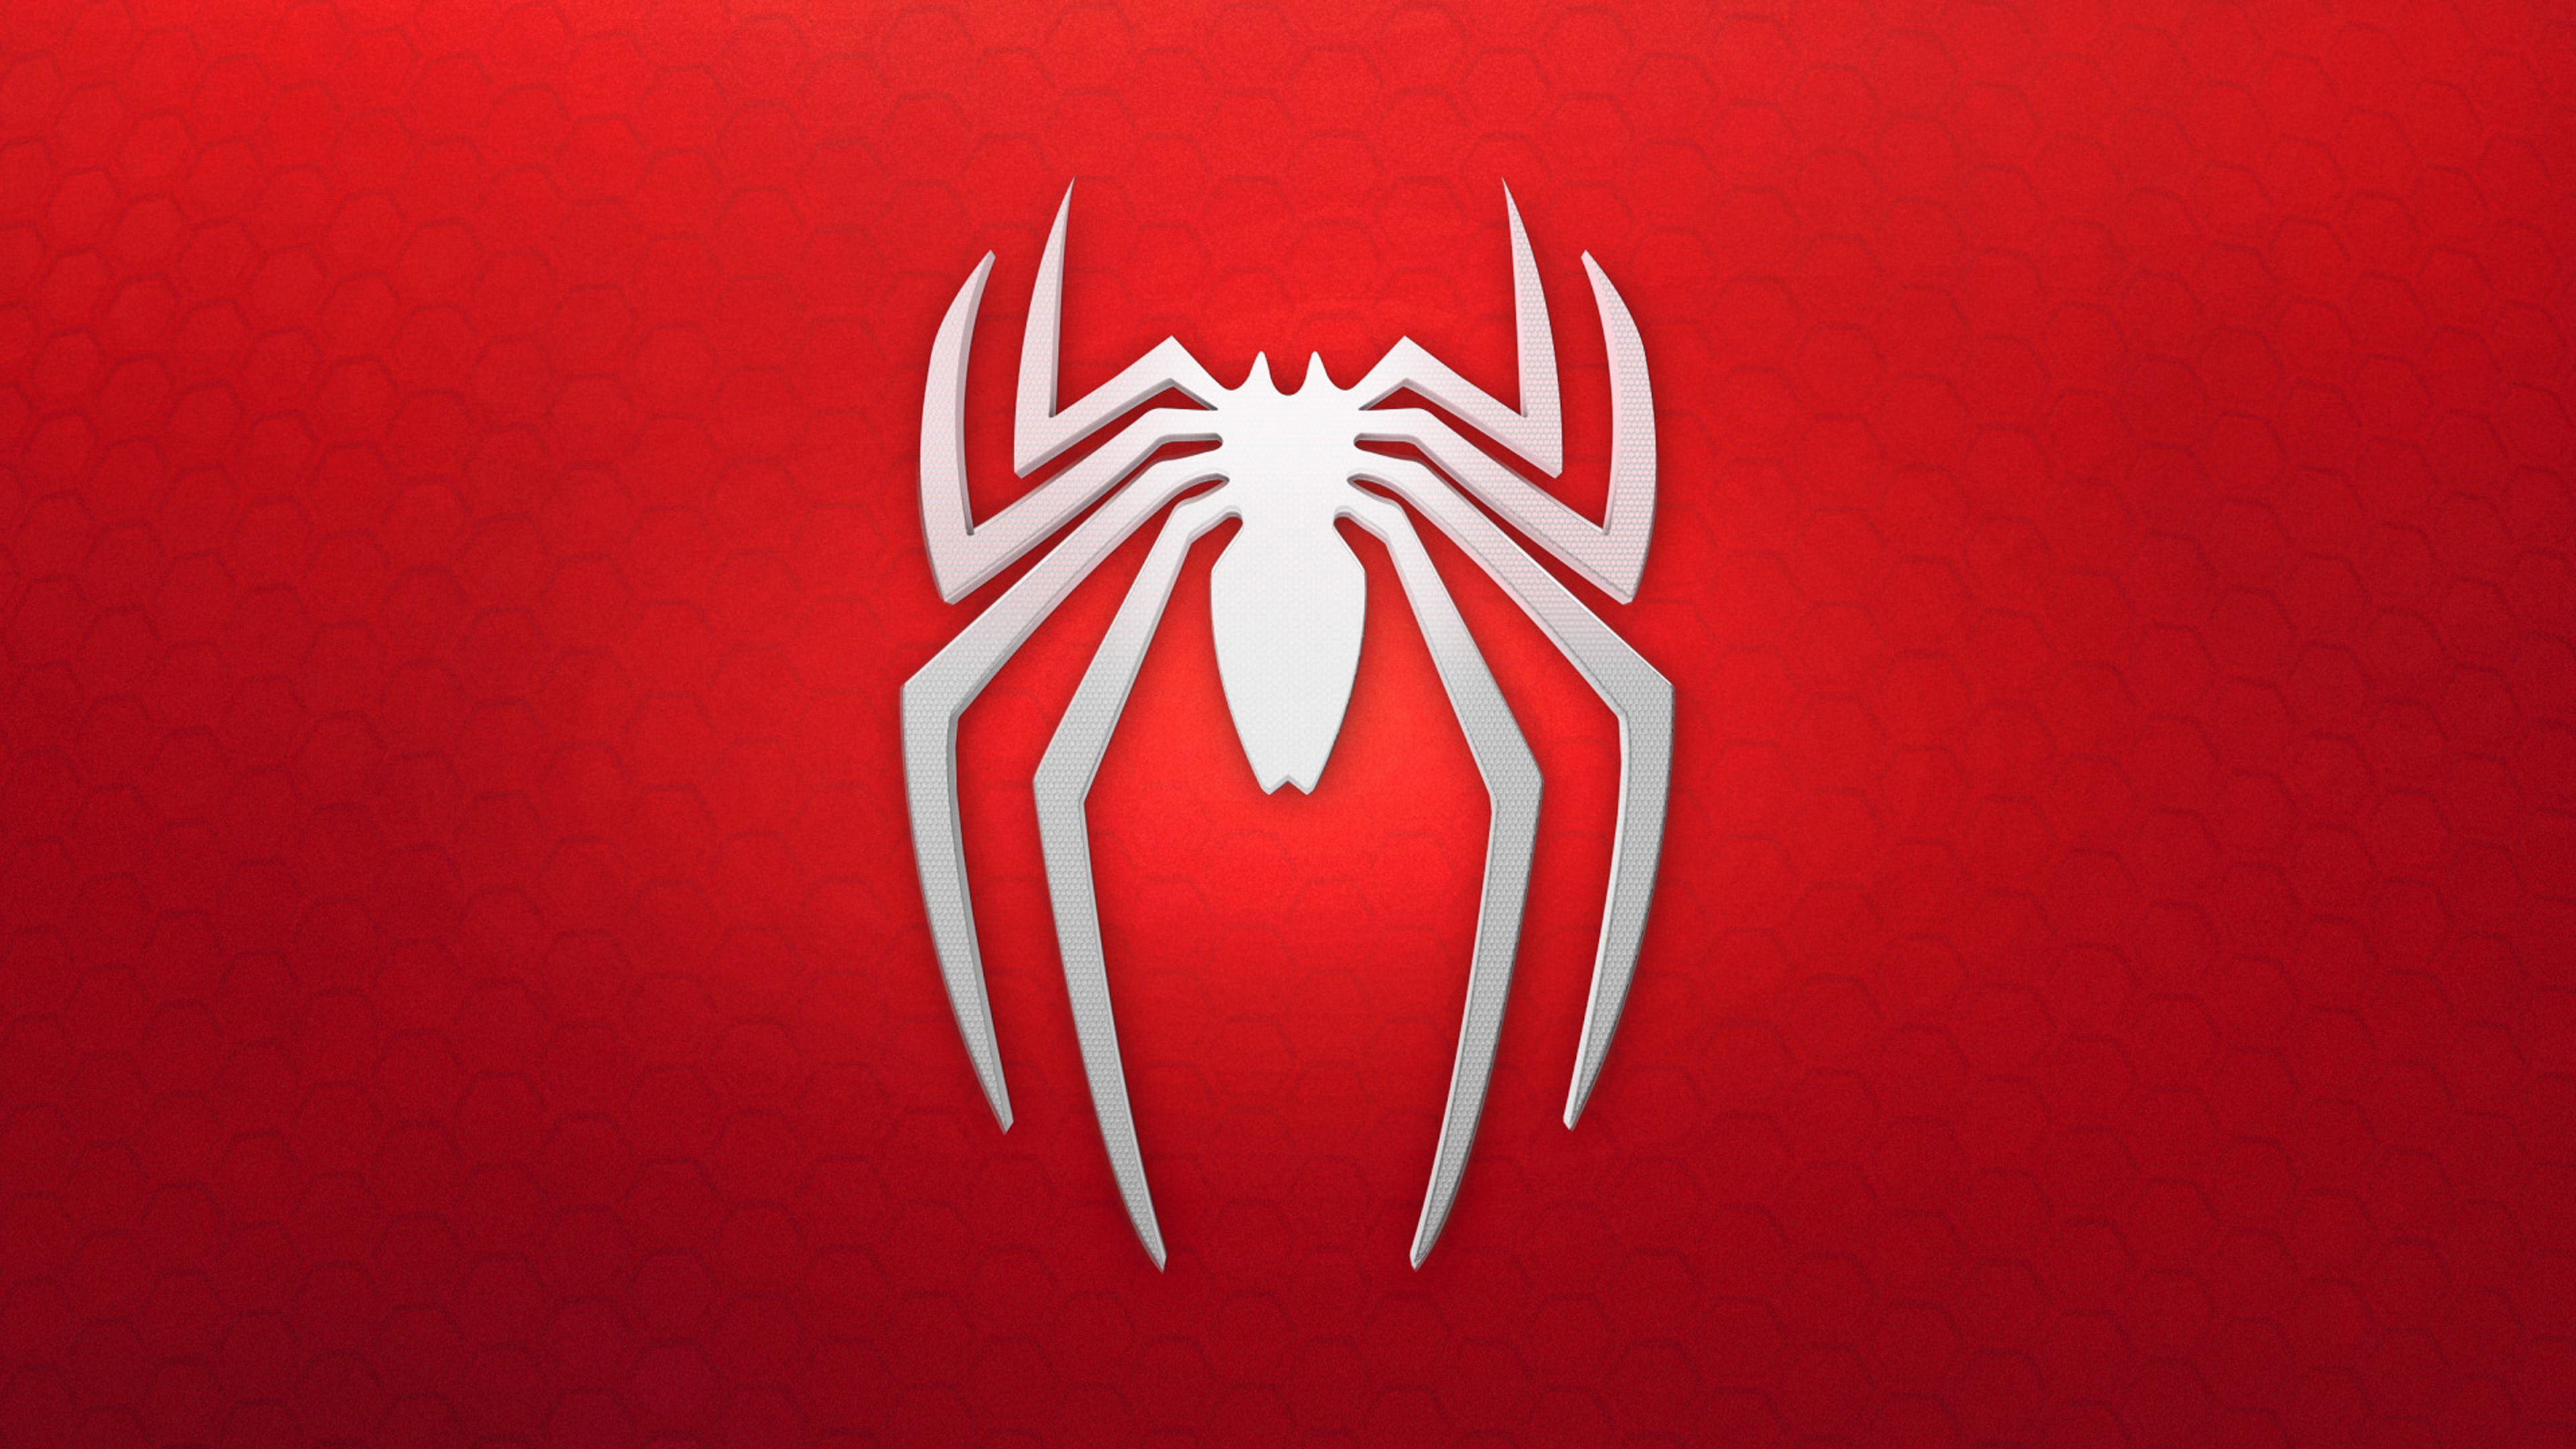 Wallpaper 4k Spiderman 4k Logo Background 4k Wallpapers Logo